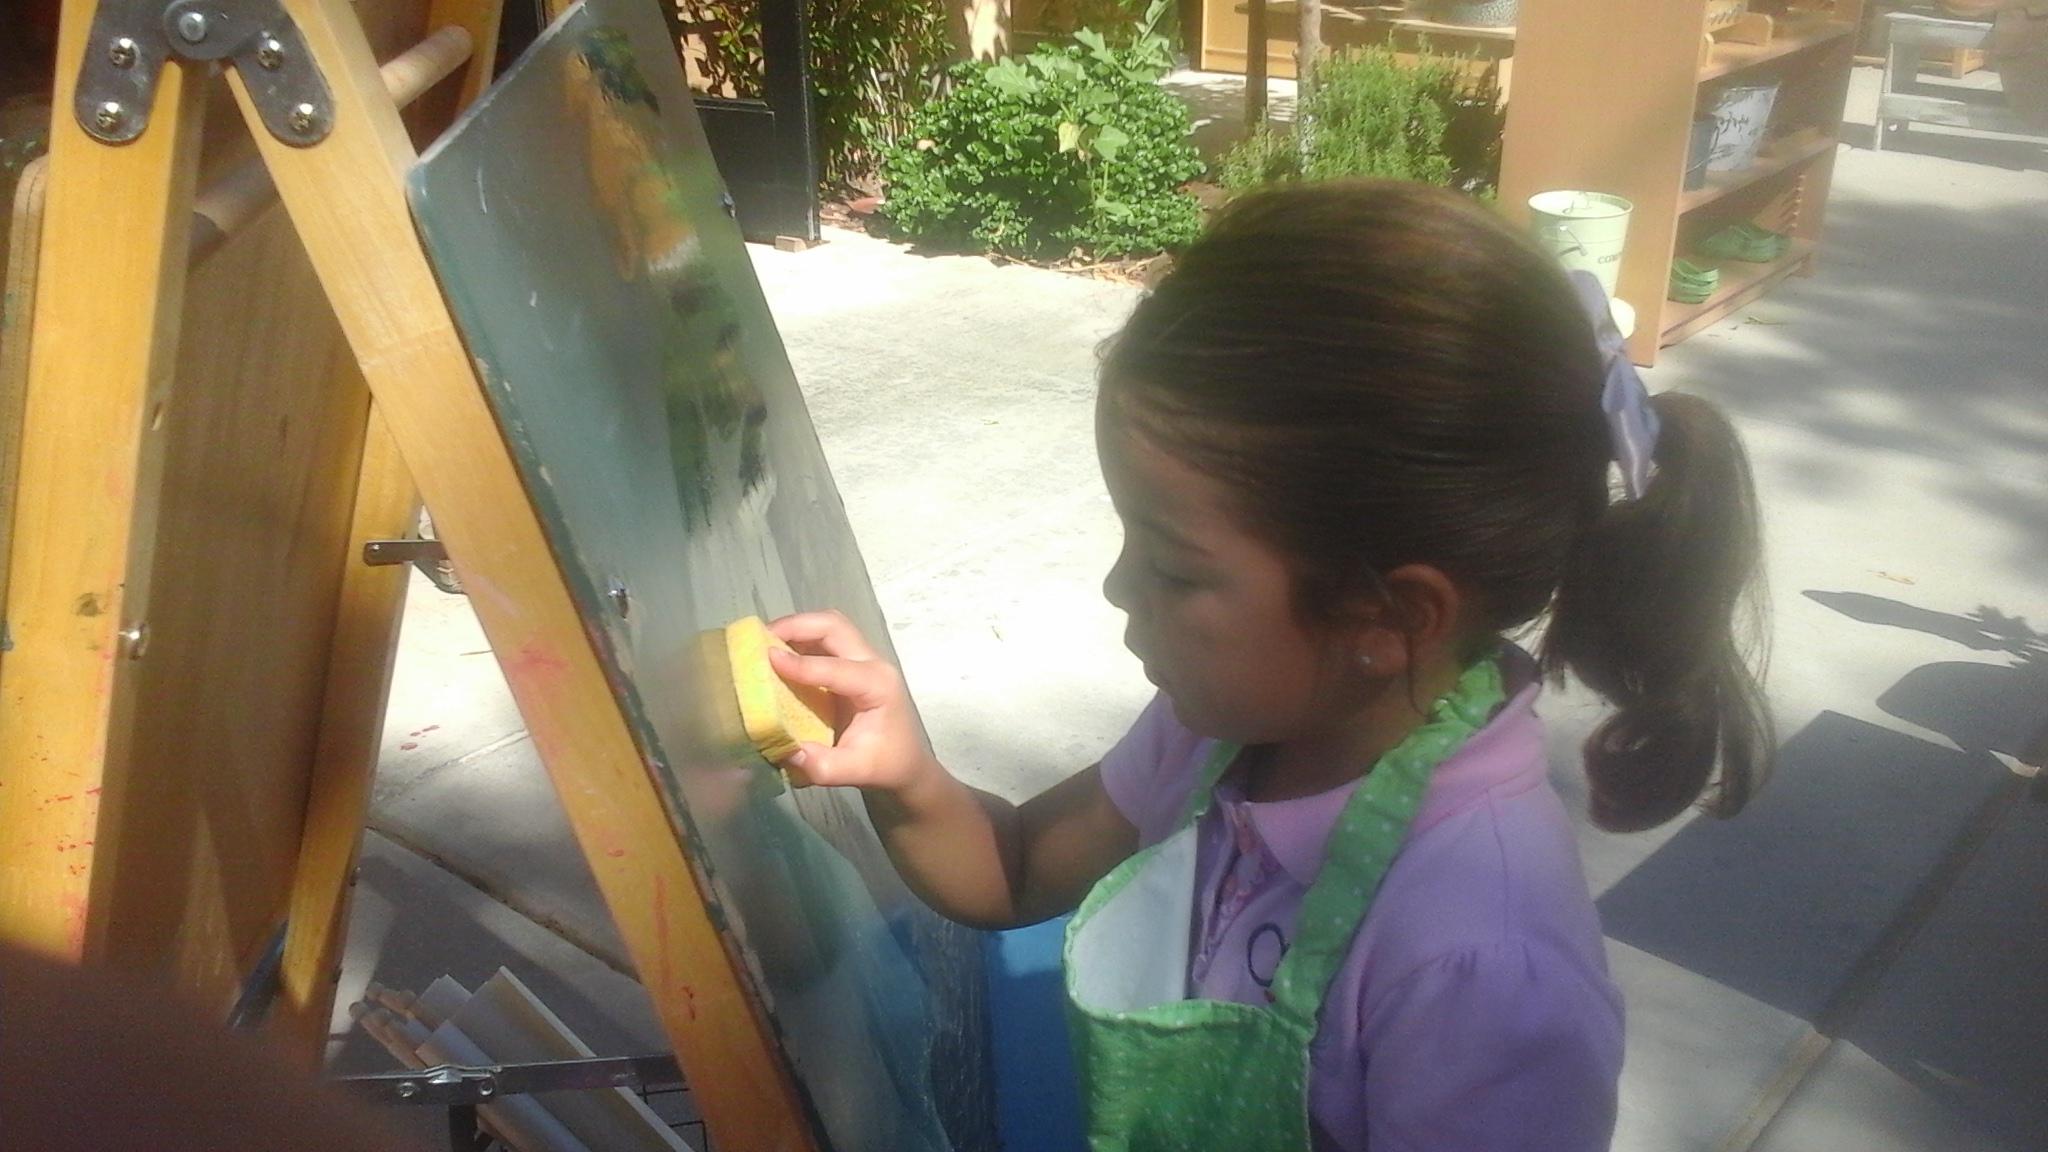 Washing a Chalkboard